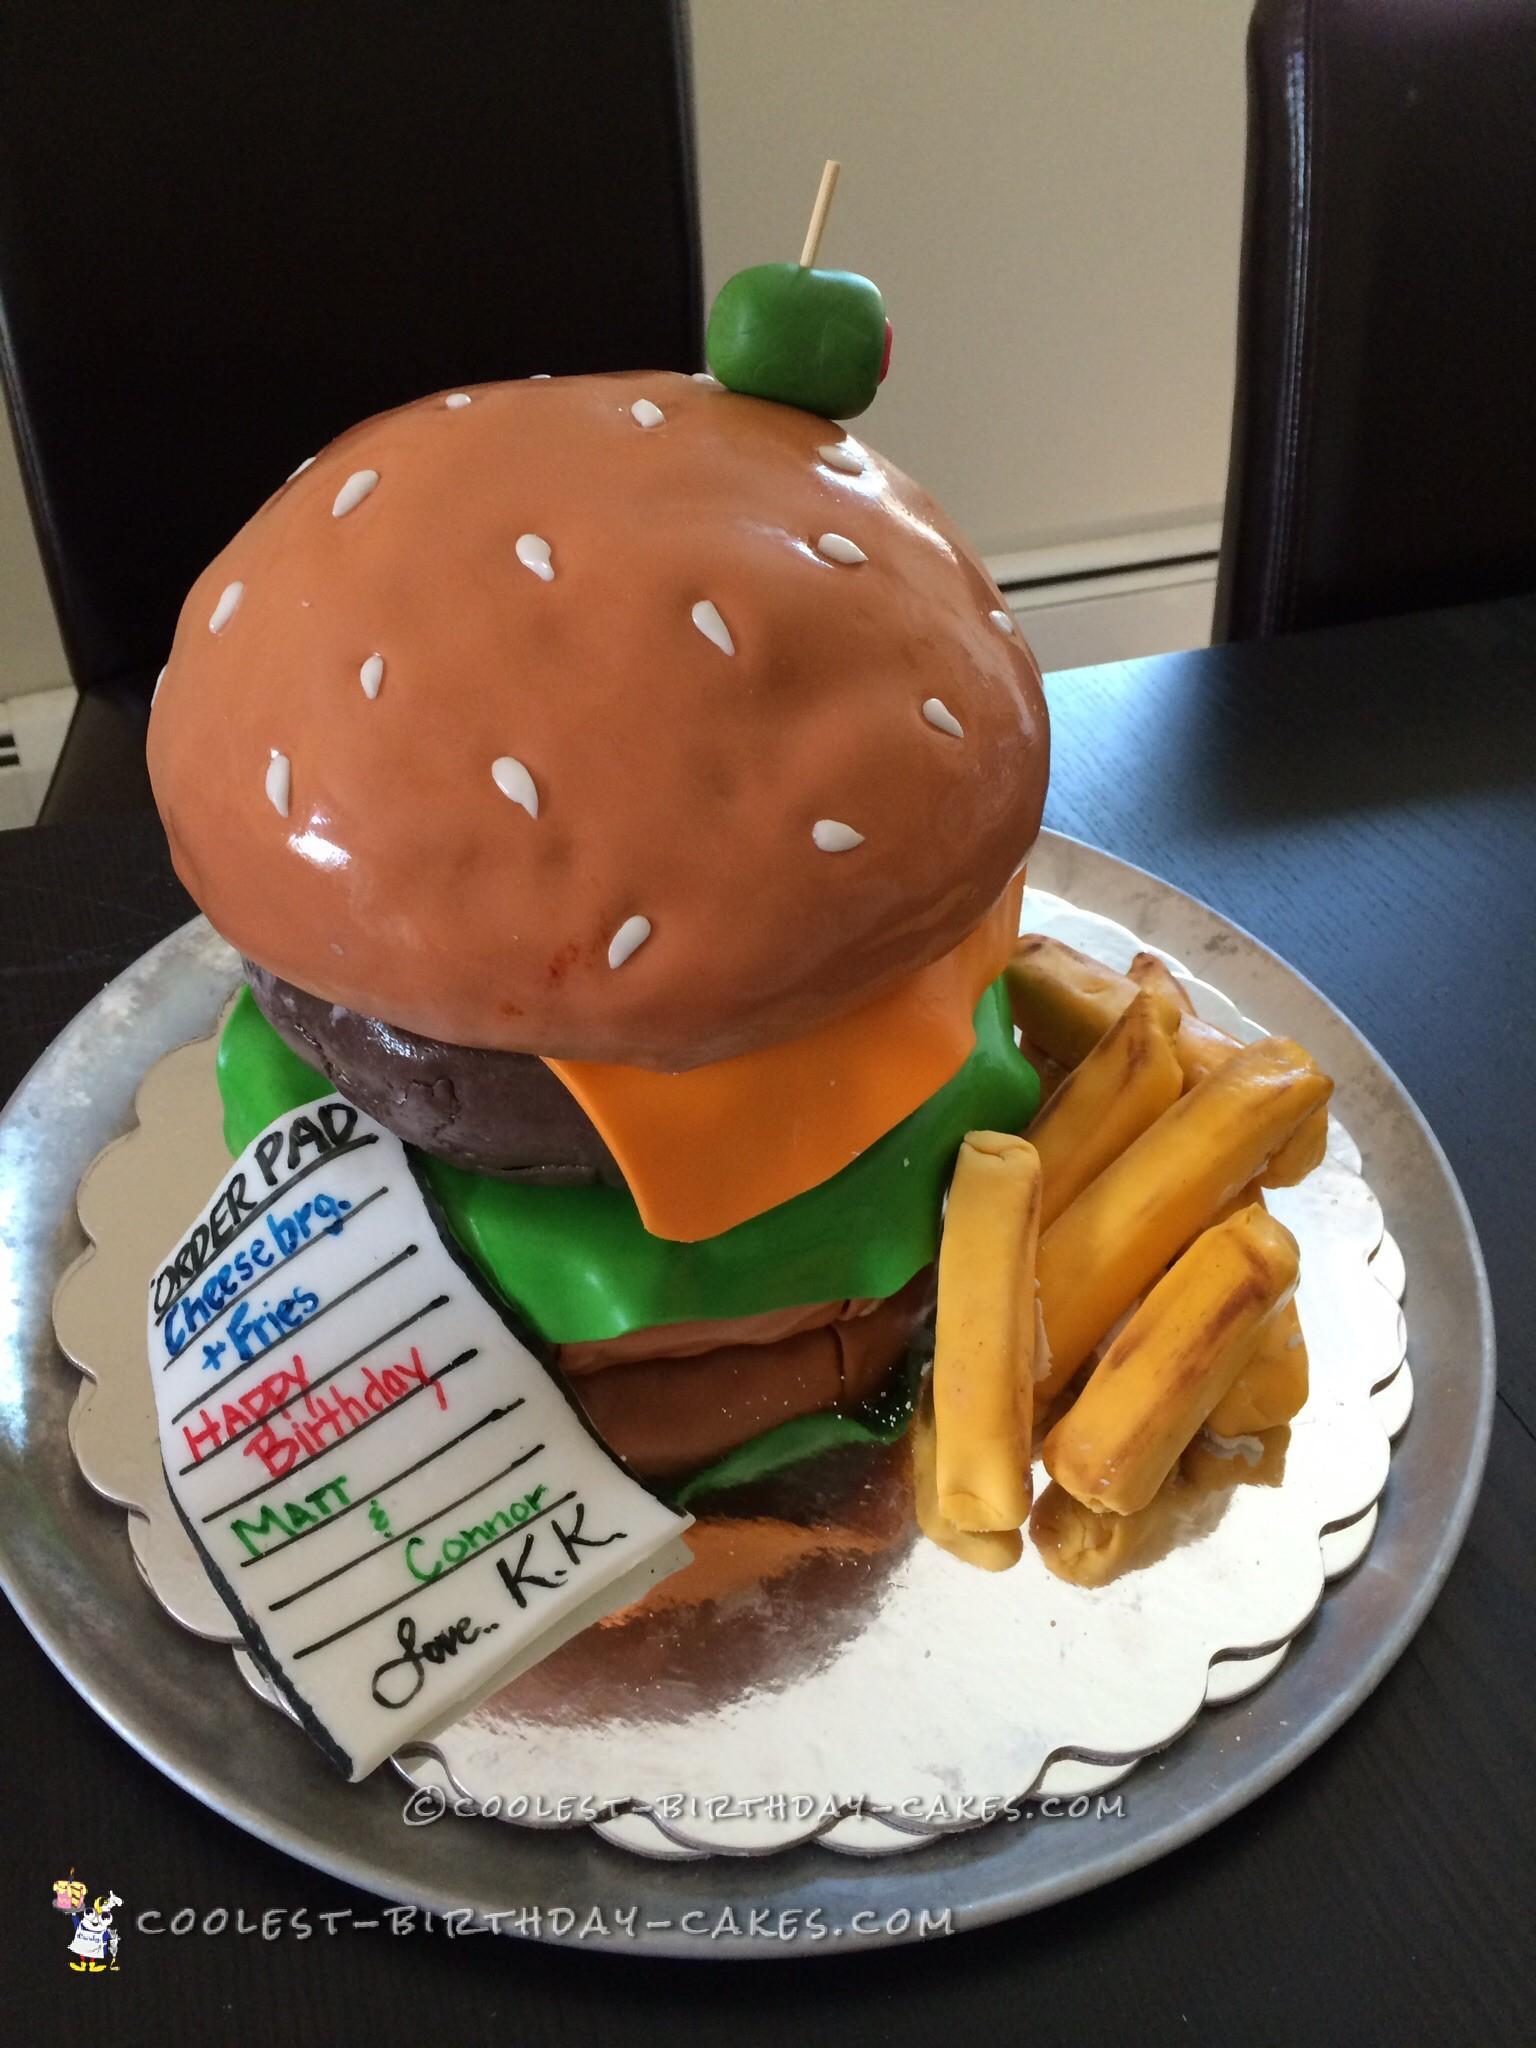 Coolest Hamburger Birthday Cake